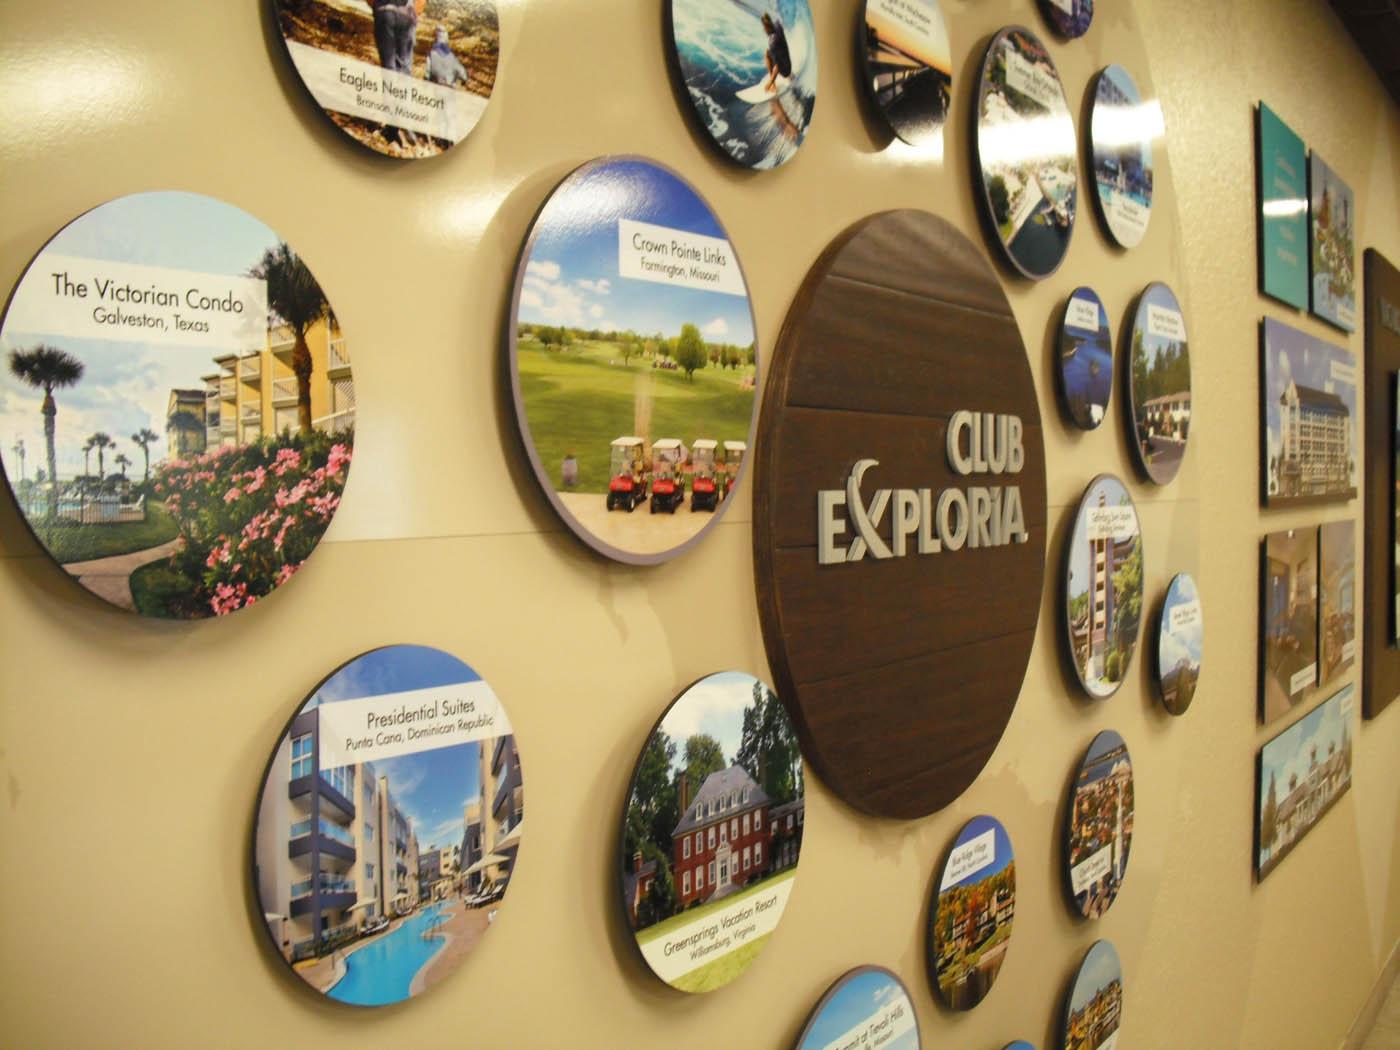 Custom Fabricated Wall Displays